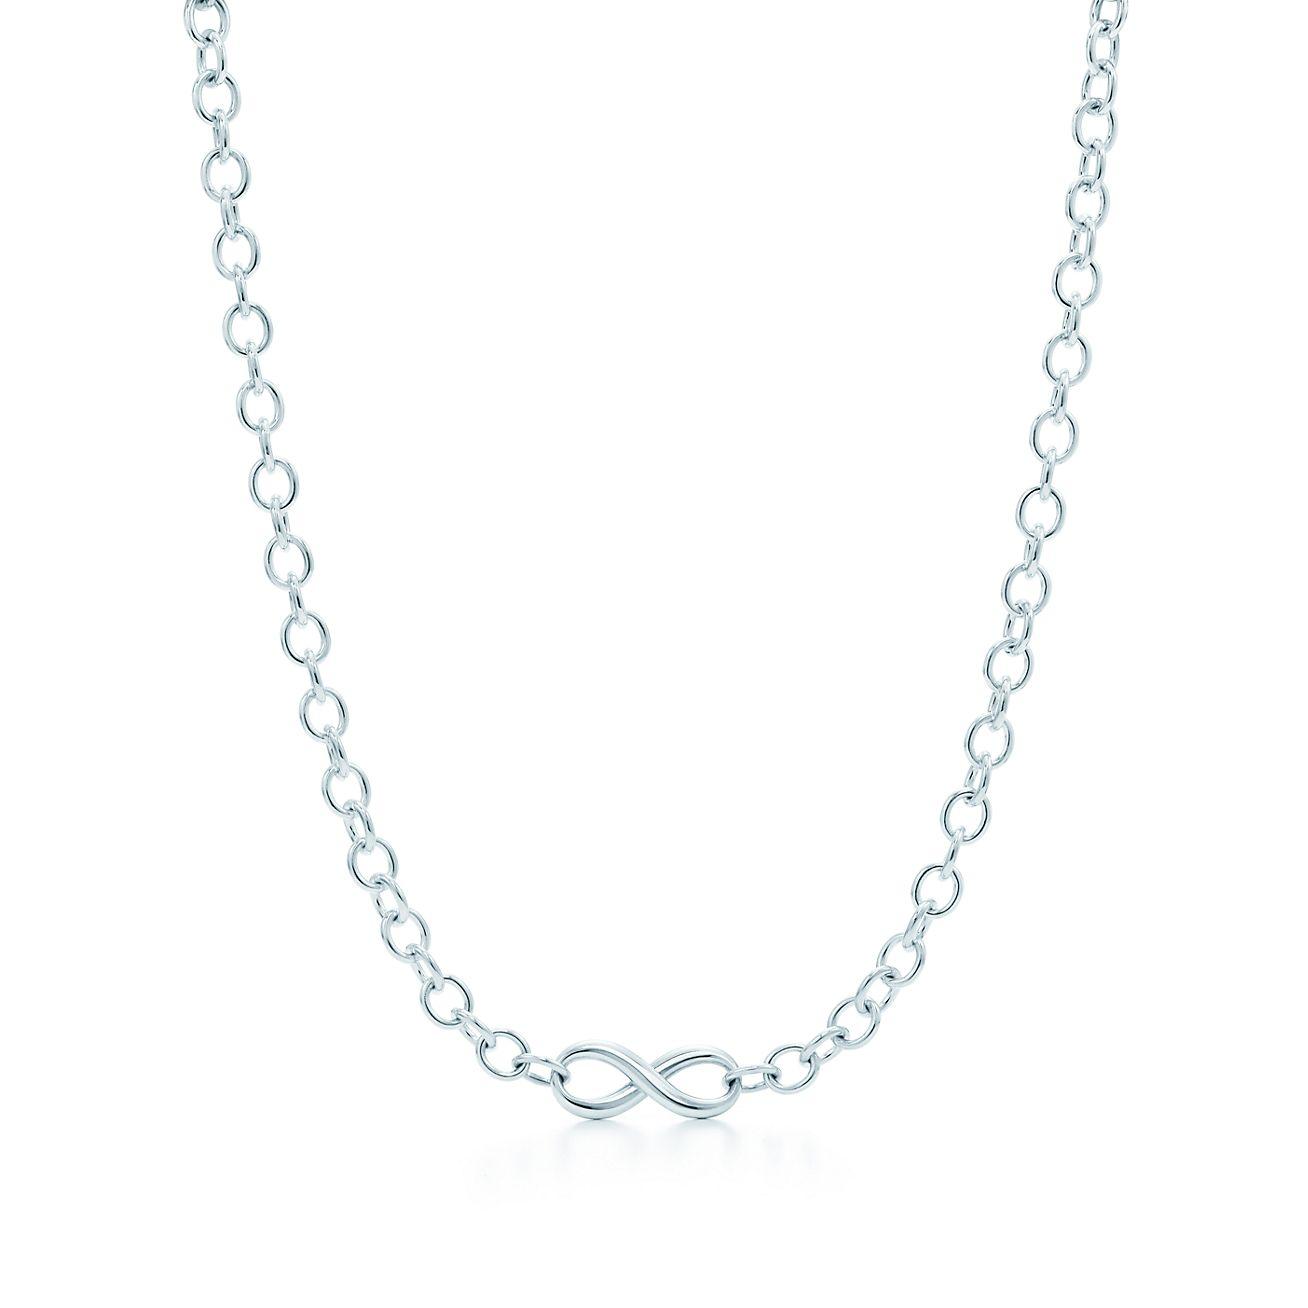 Tiffany Inspired Infinity Necklace Tiffany Infinity:necklace